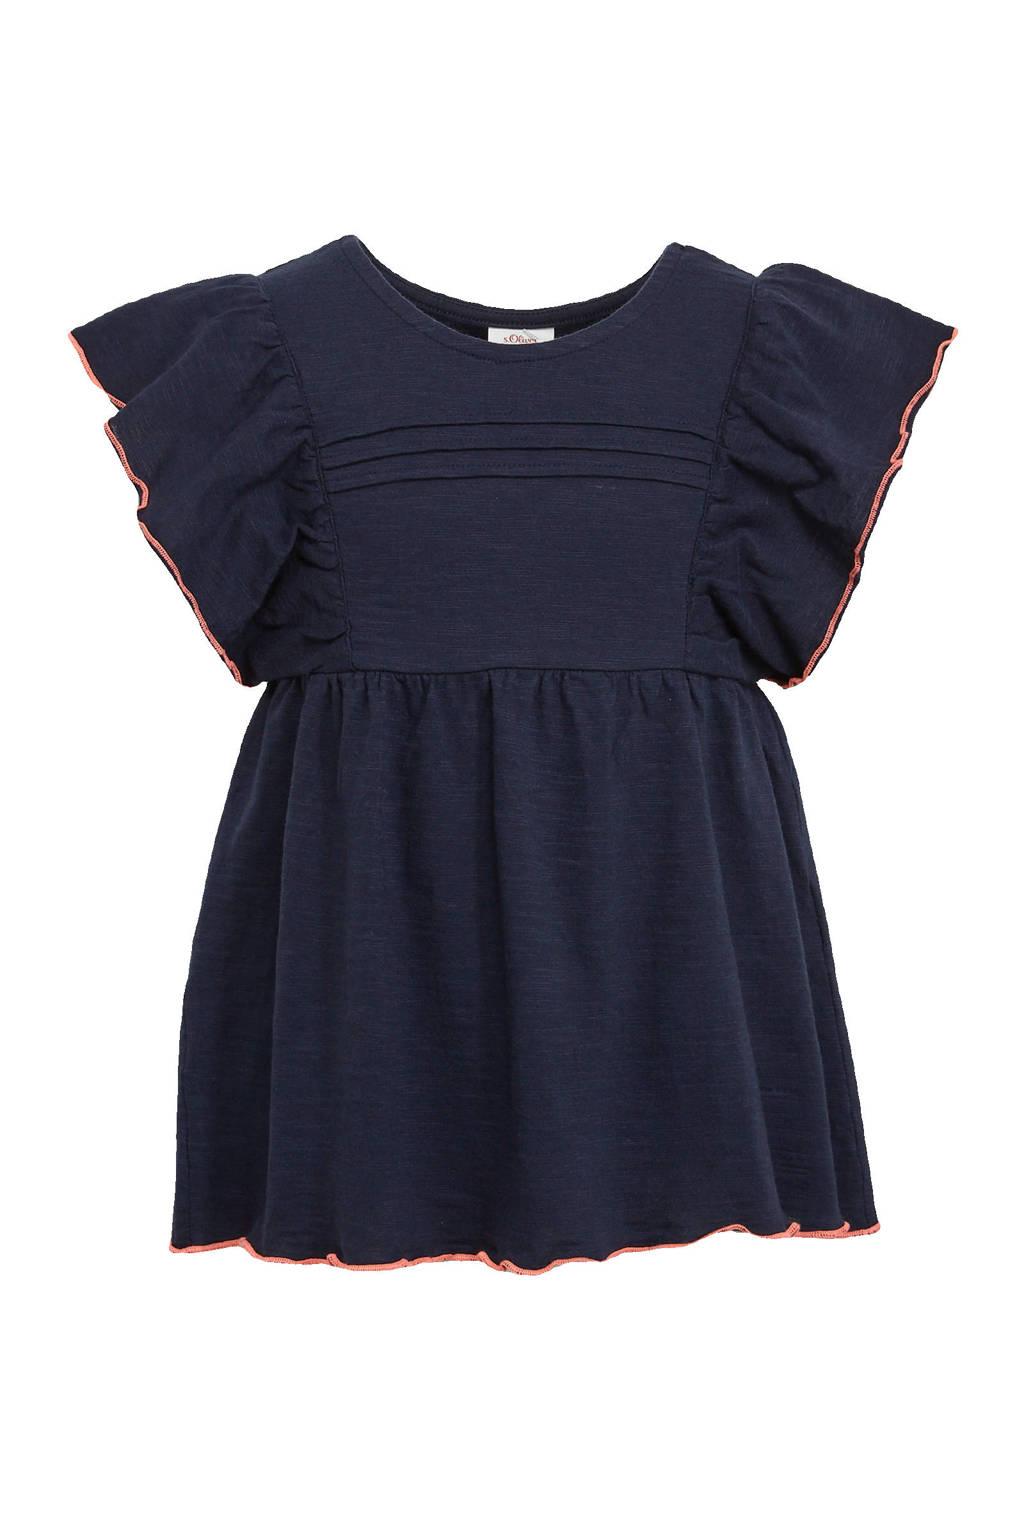 s.Oliver gemêleerd T-shirt met contrastbies en ruches donkerblauw, Donkerblauw